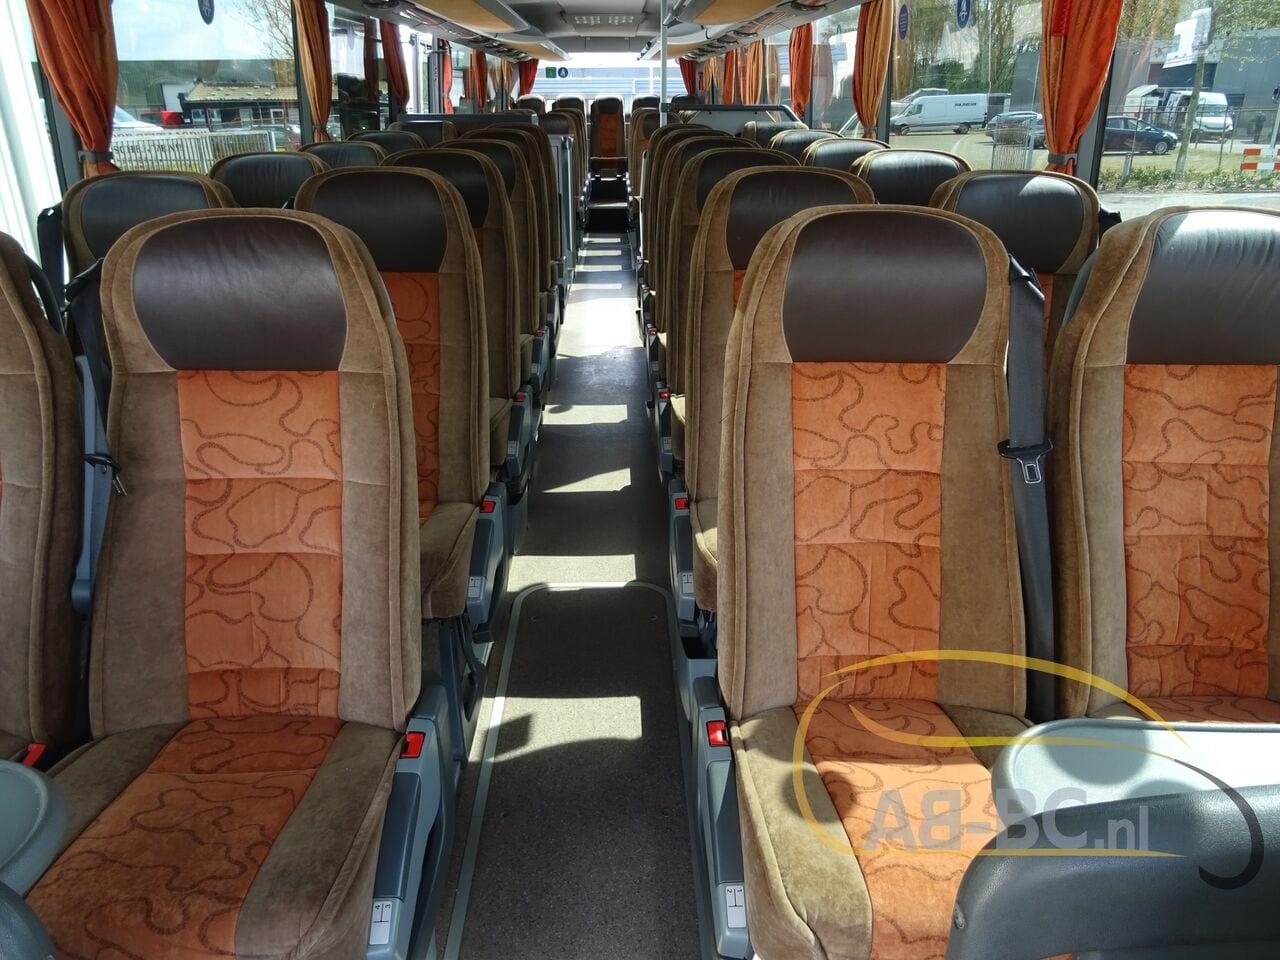 coach-busSETRA-S416H-48-SEATS-LIFTBUS---1620309863213768713_big_f29fcfbf7e04f21a63d0490a253bc096--21050616581387095000